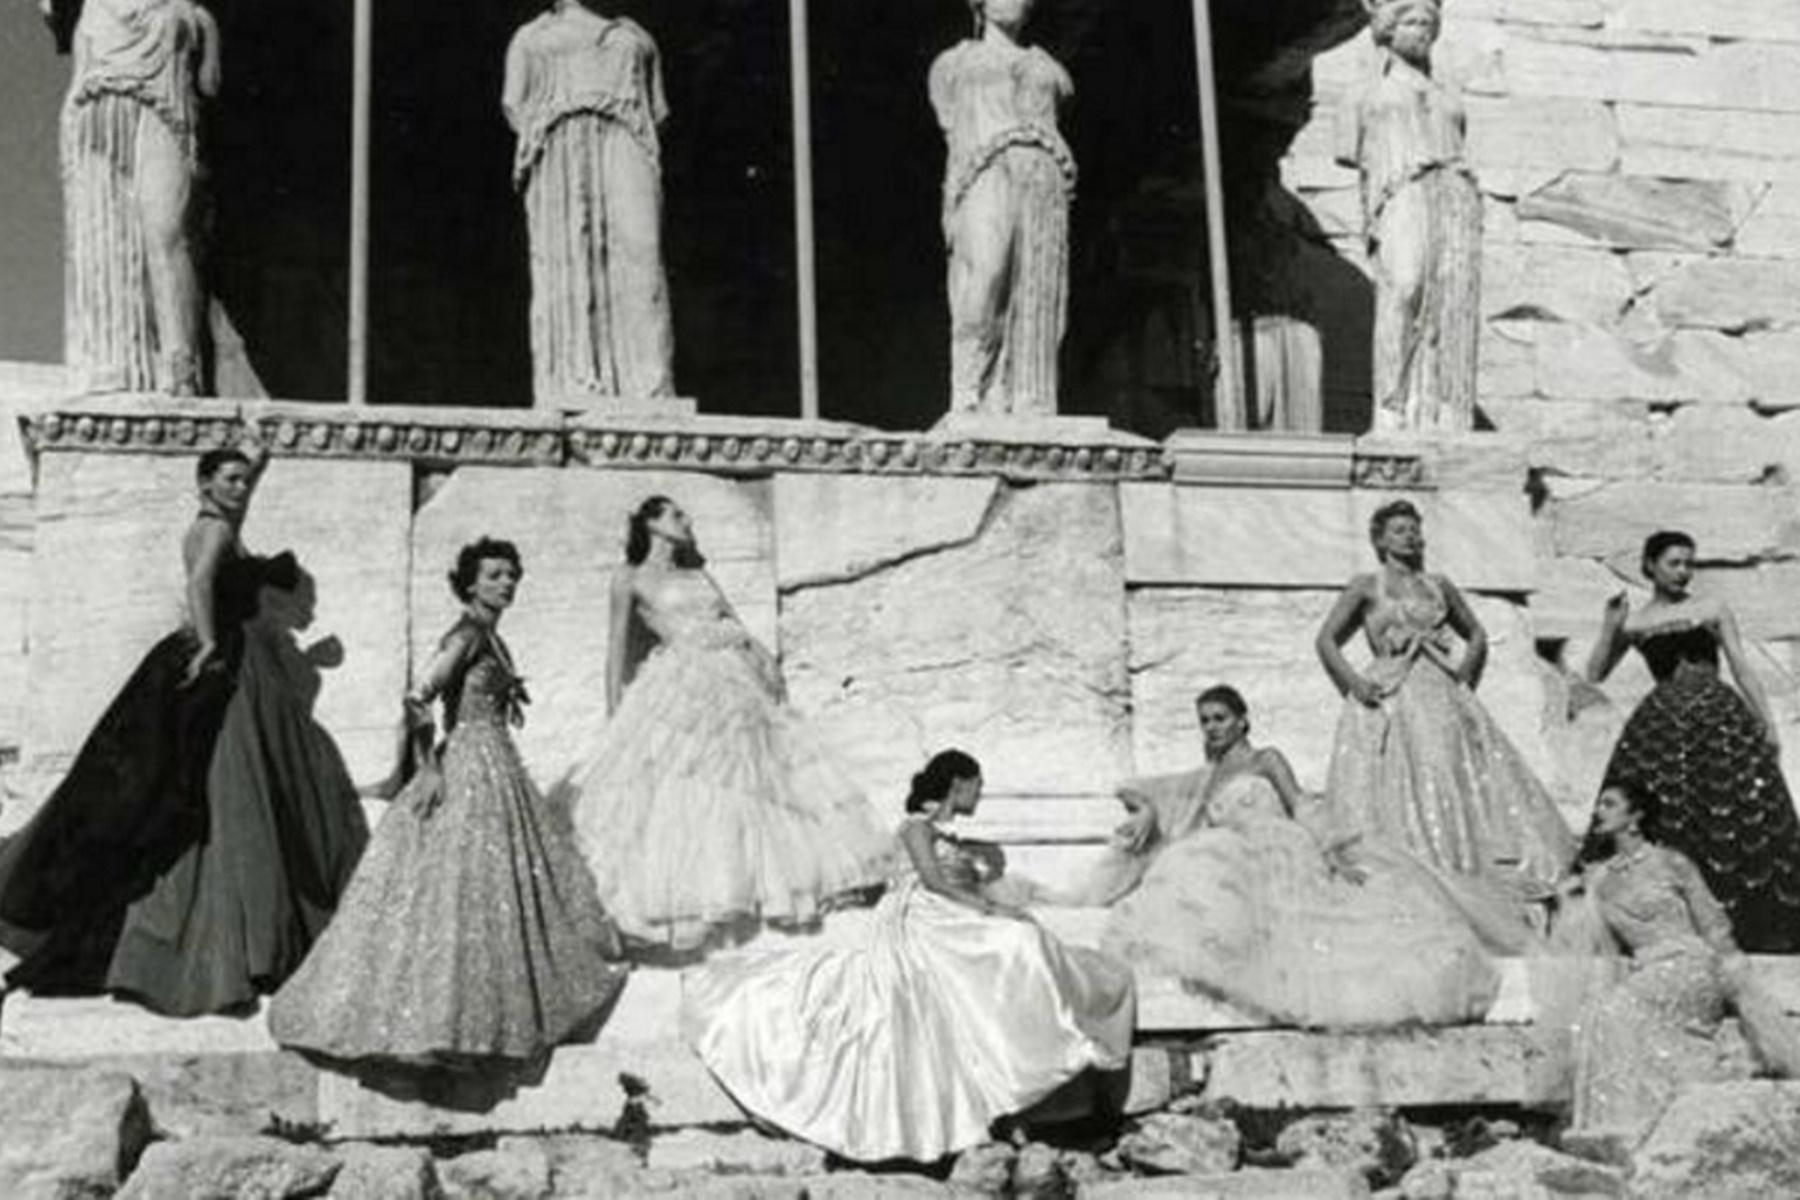 Dior : Φαντασμαγορική βραδιά στο Καλιμάρμαρο